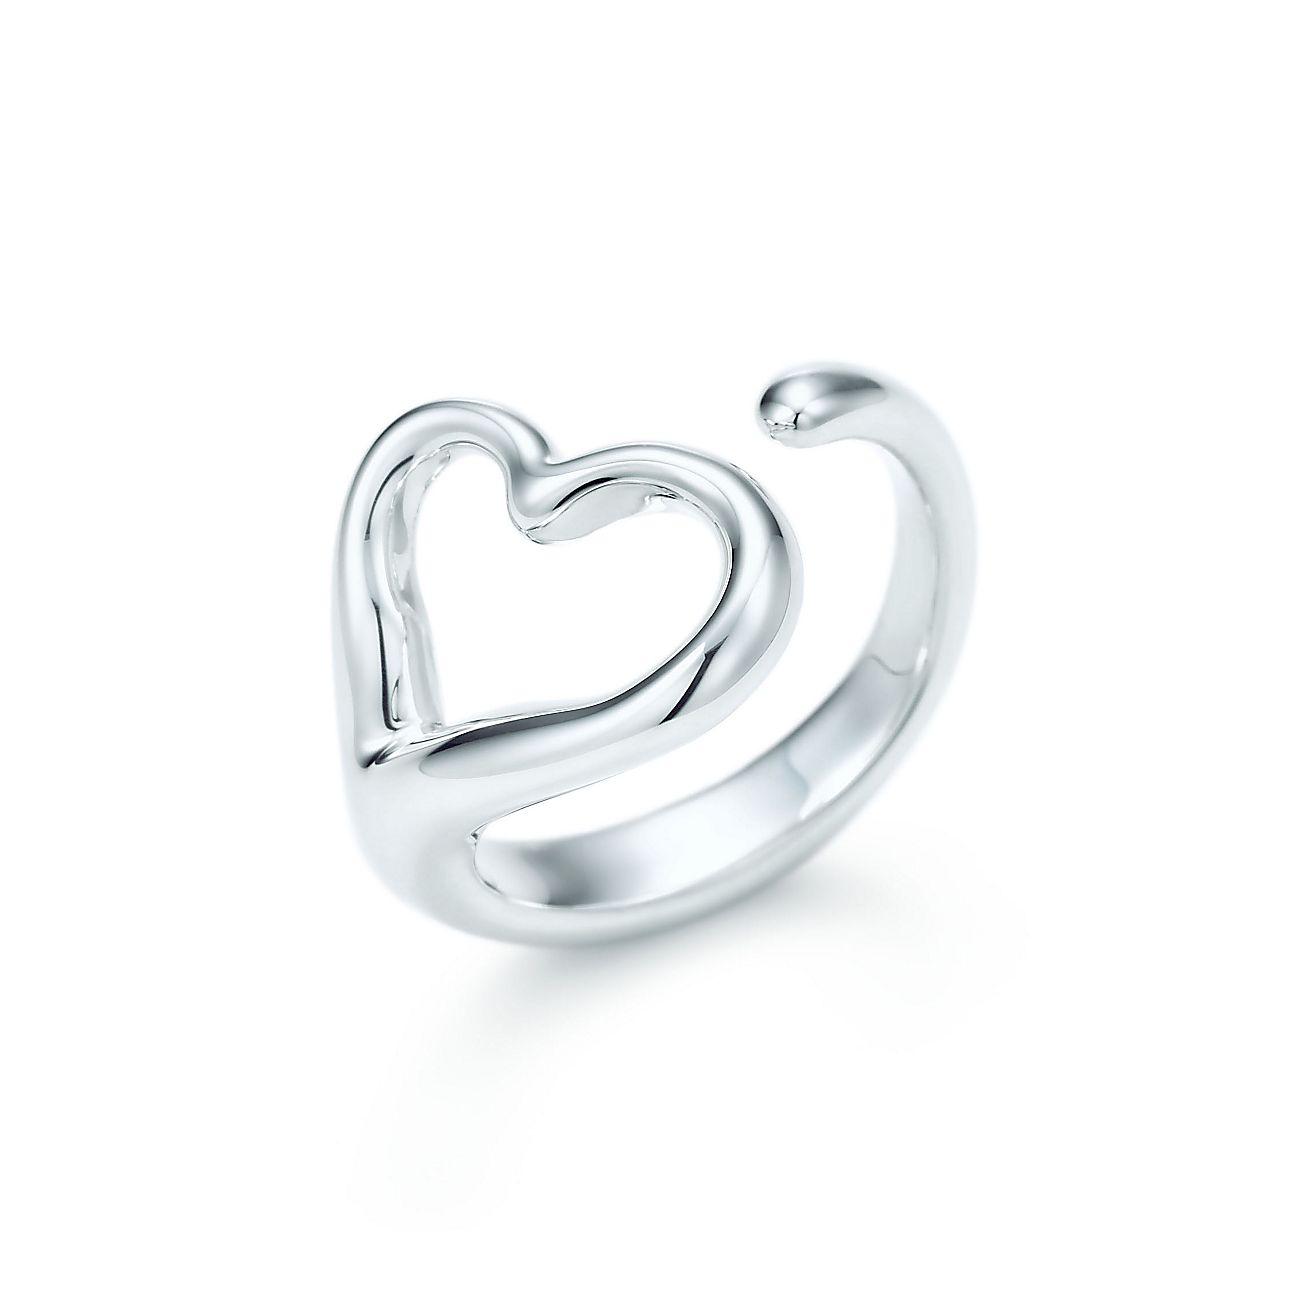 elsa peretti open heart ring in sterling silver medium tiffany co. Black Bedroom Furniture Sets. Home Design Ideas